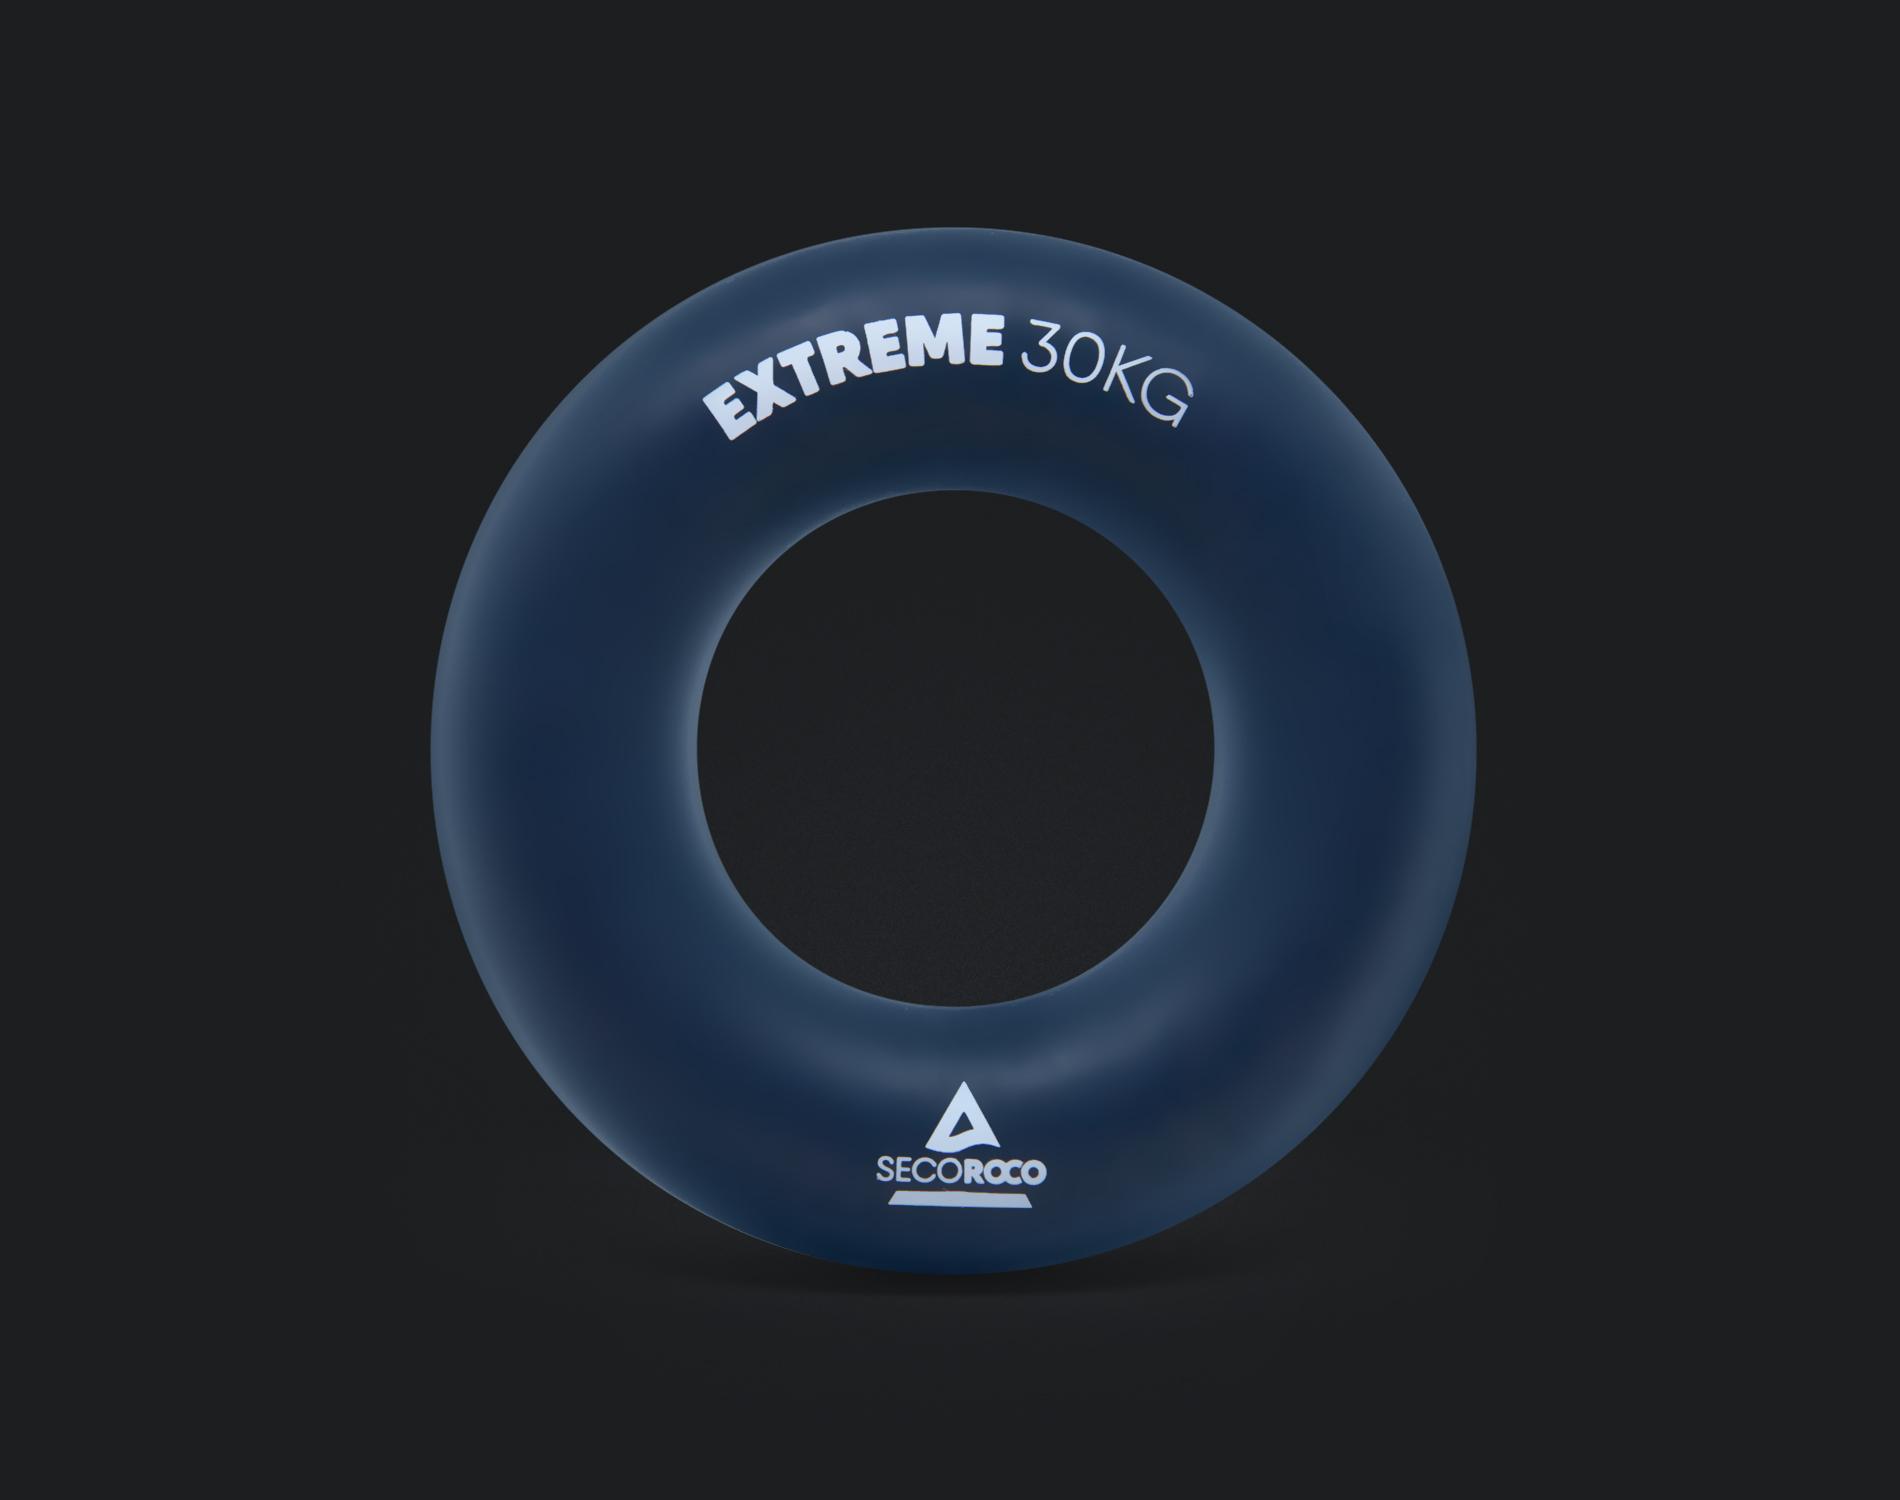 Handtrainer Extreme 30KG